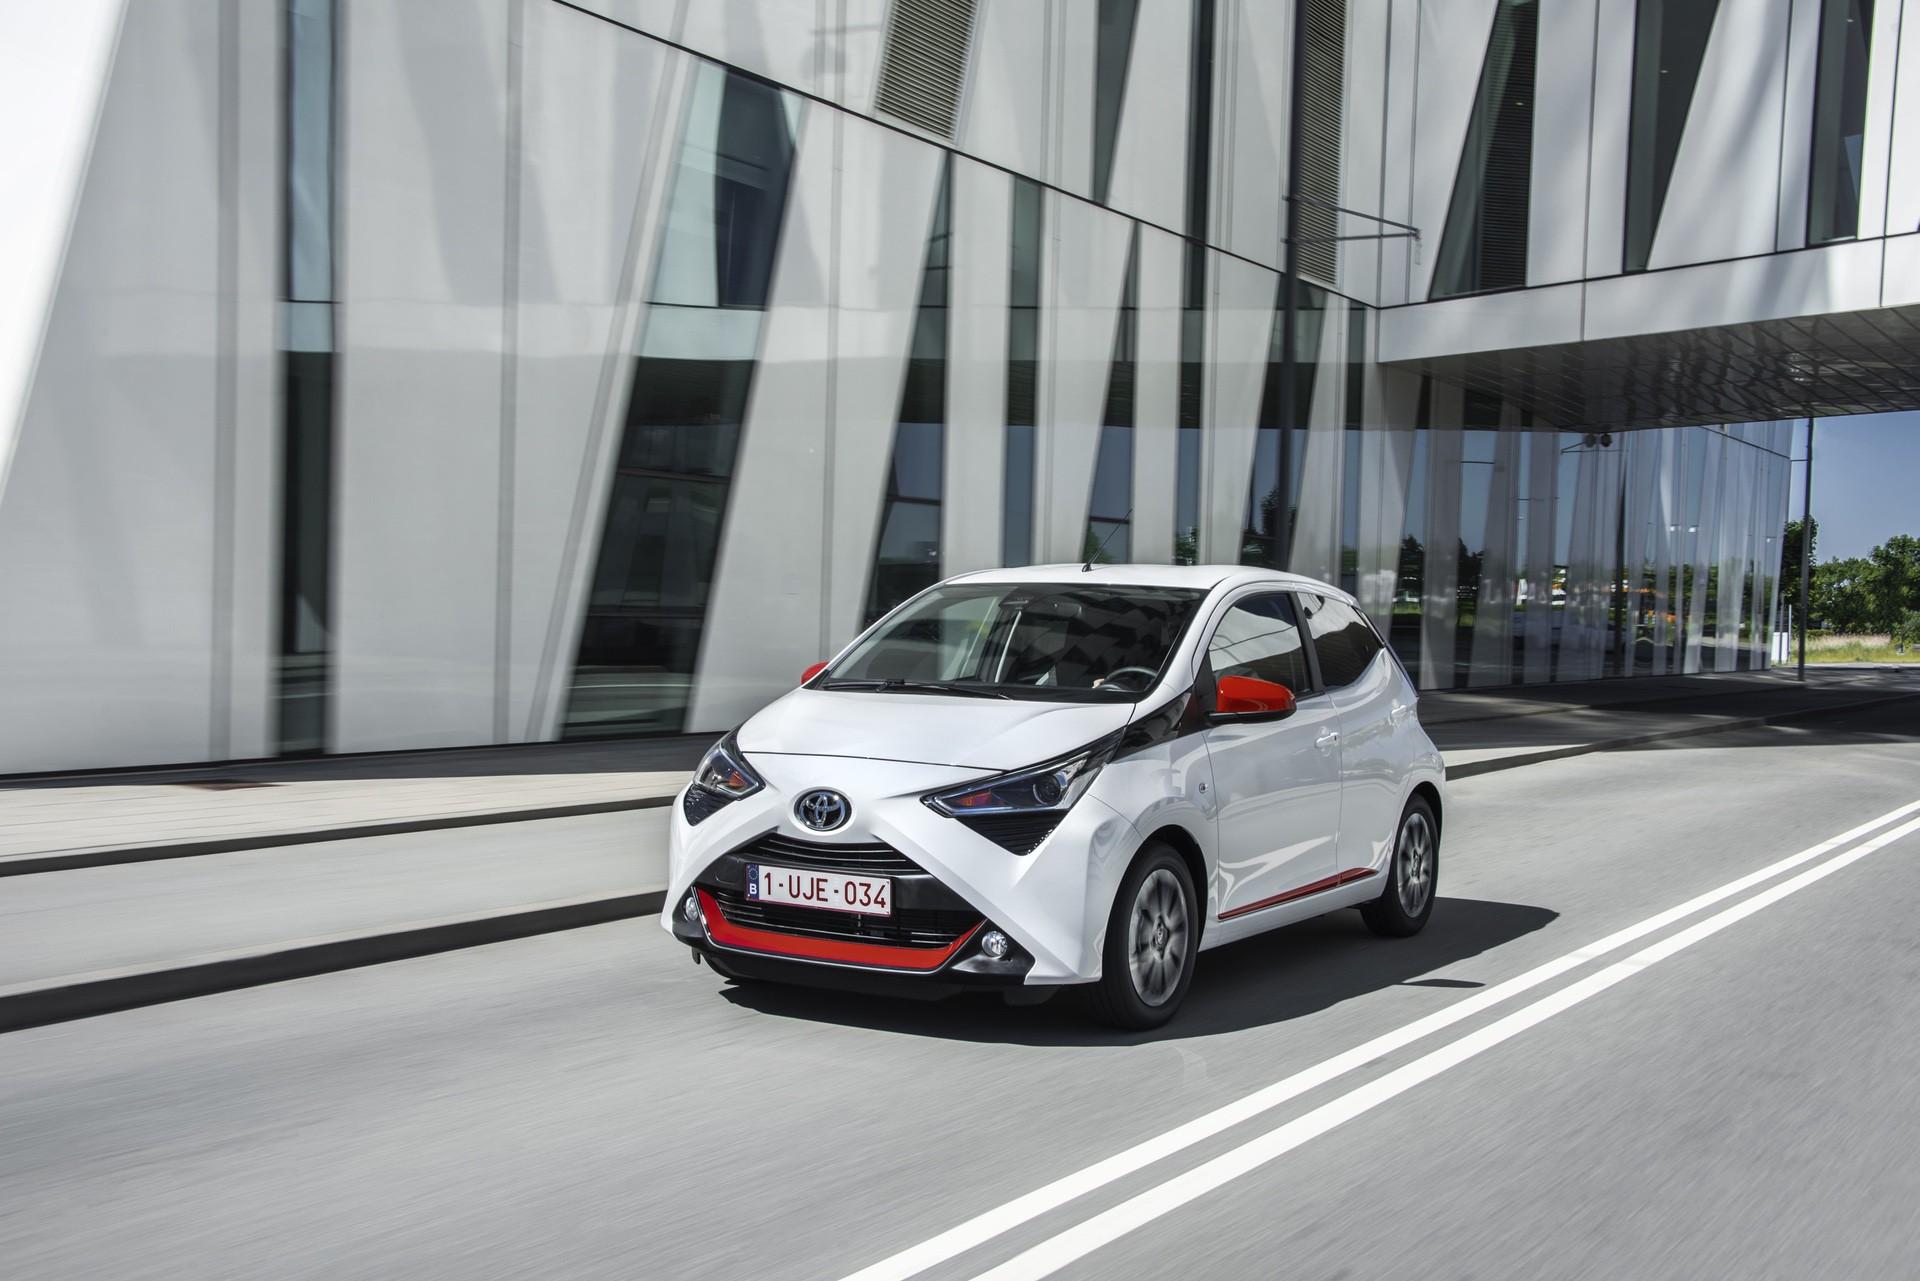 Toyota_Aygo_facelift_presskit_0067